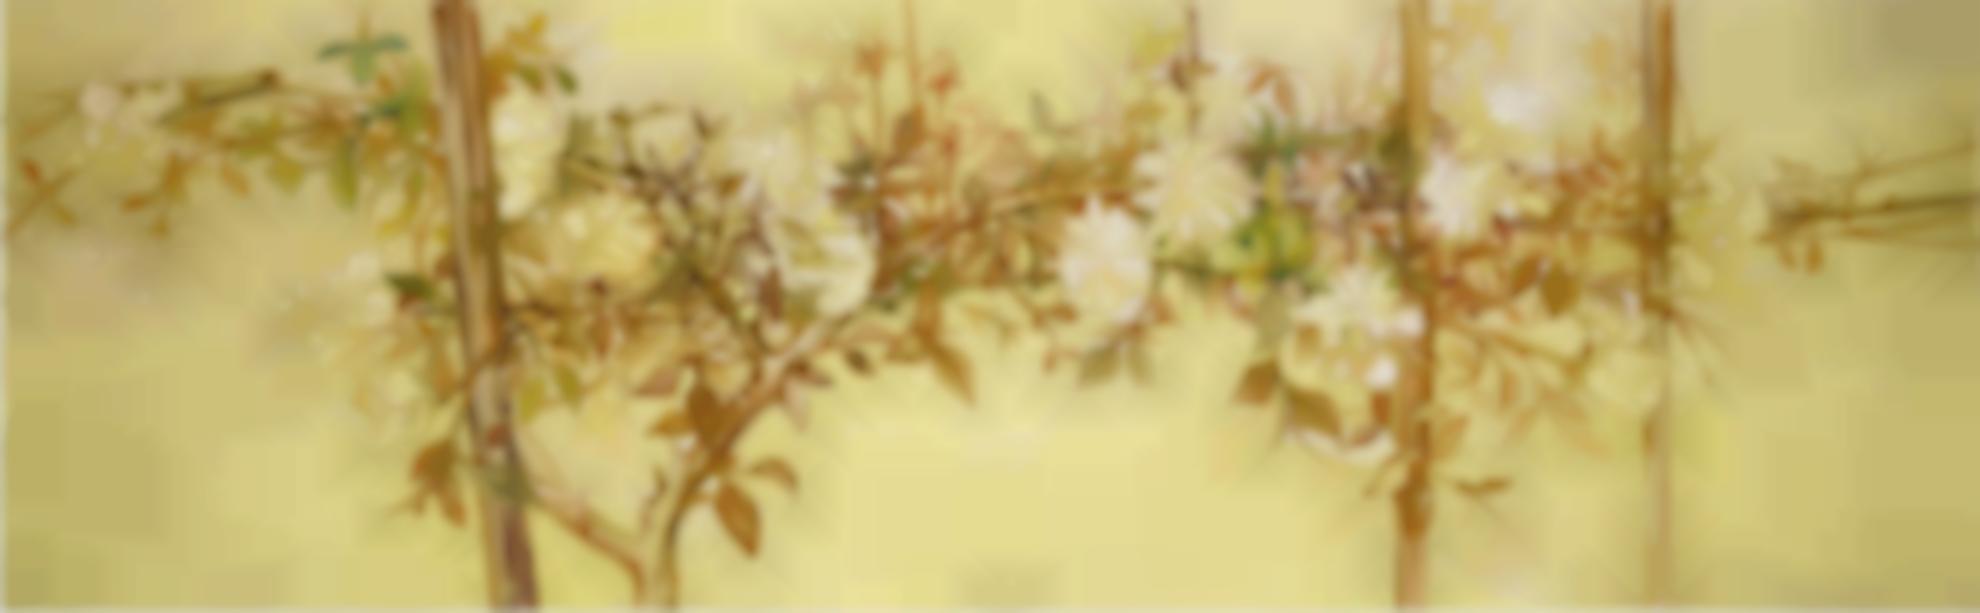 Edward Middleditch - Yellow Roses-1955